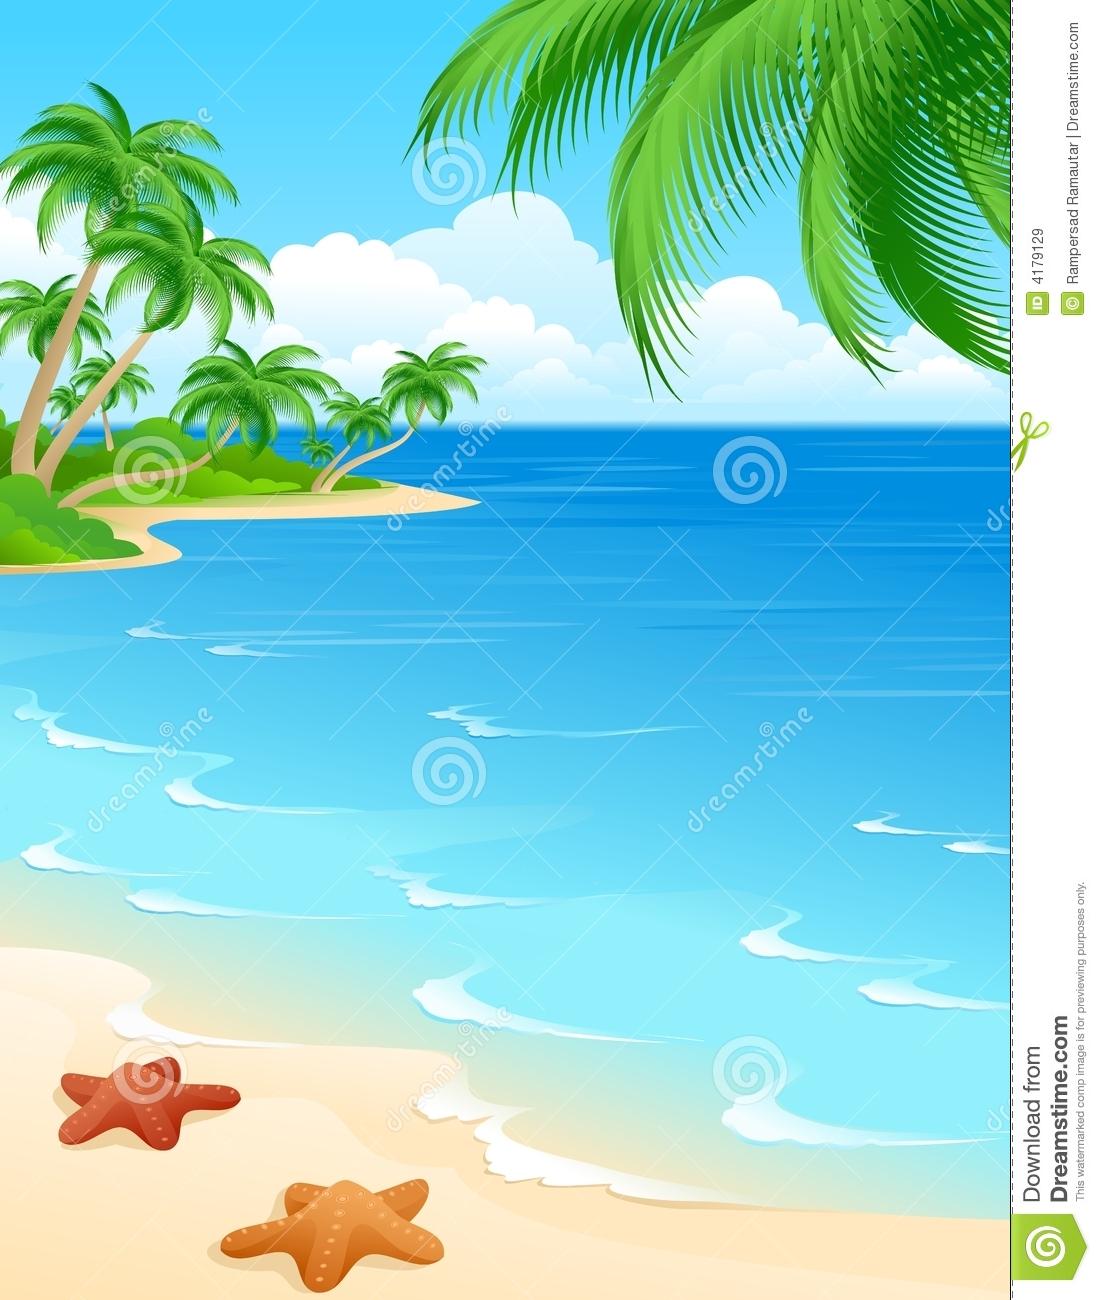 Beautiful beach clipart - Clipground